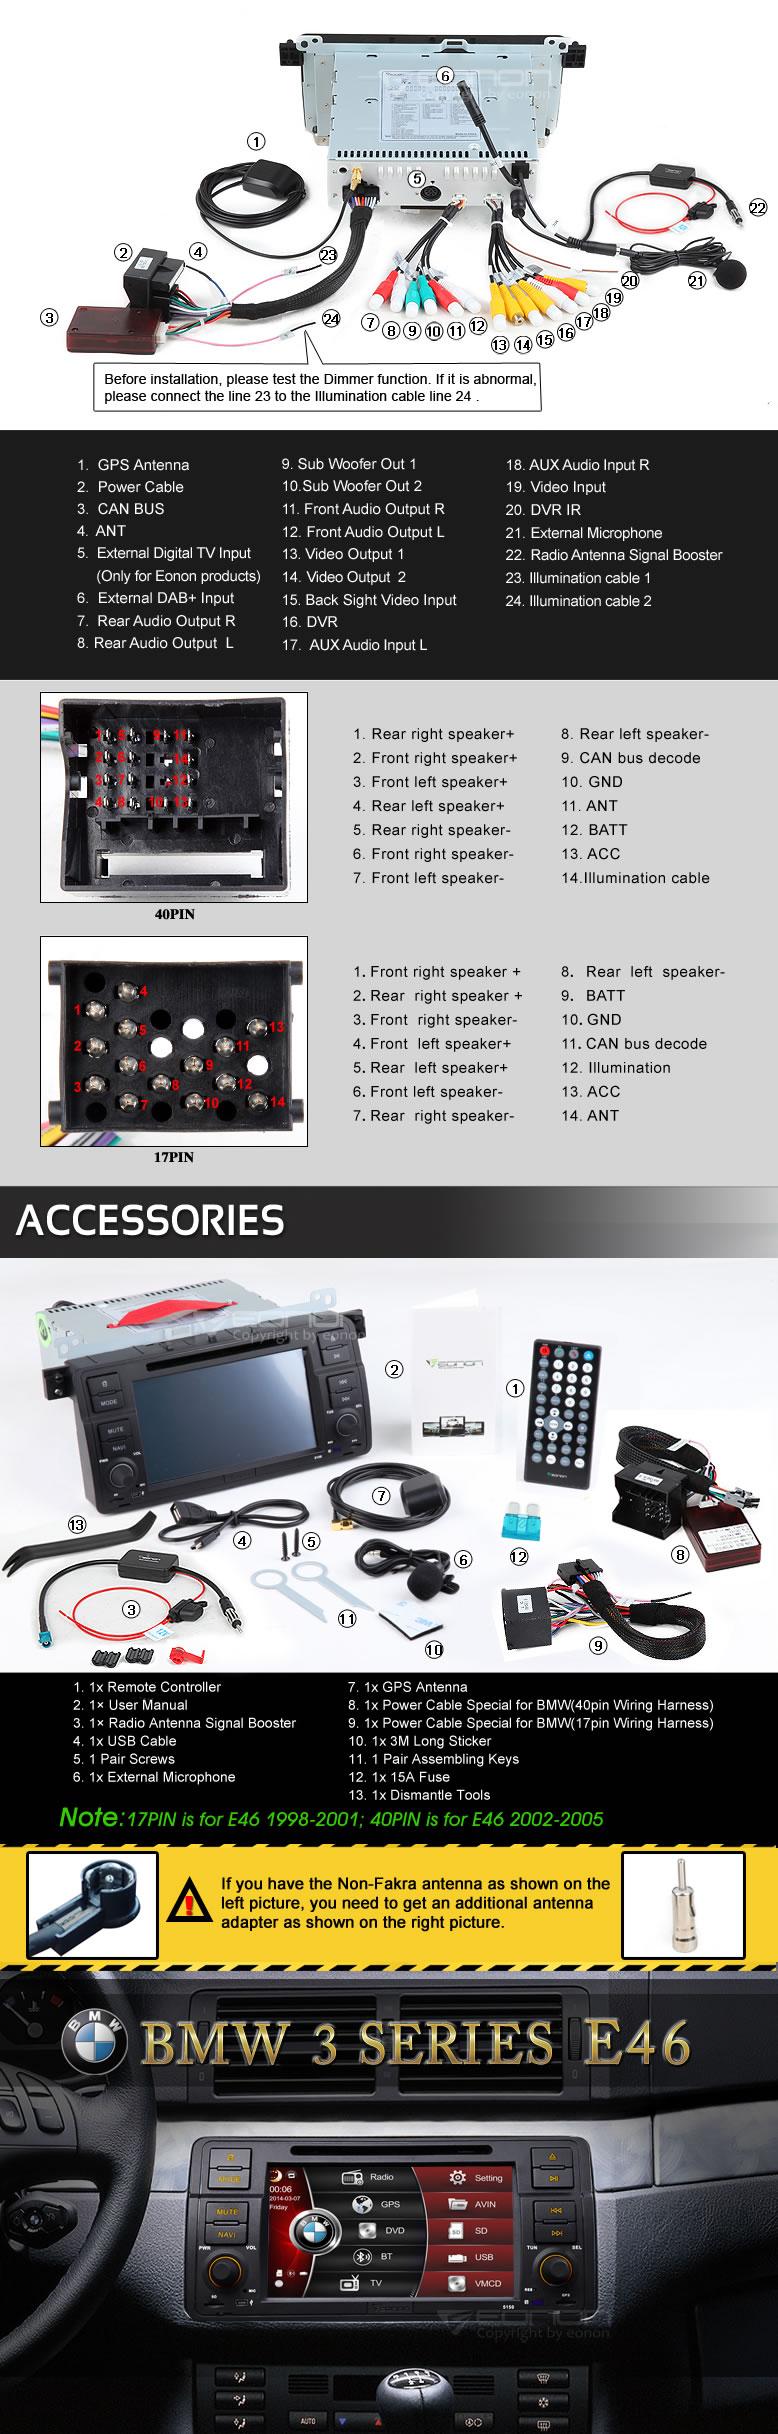 medium resolution of wince vehicle specific gps dv bmw e46 98 05 eonon 7 car hd dvd gps car iso stereo wiring